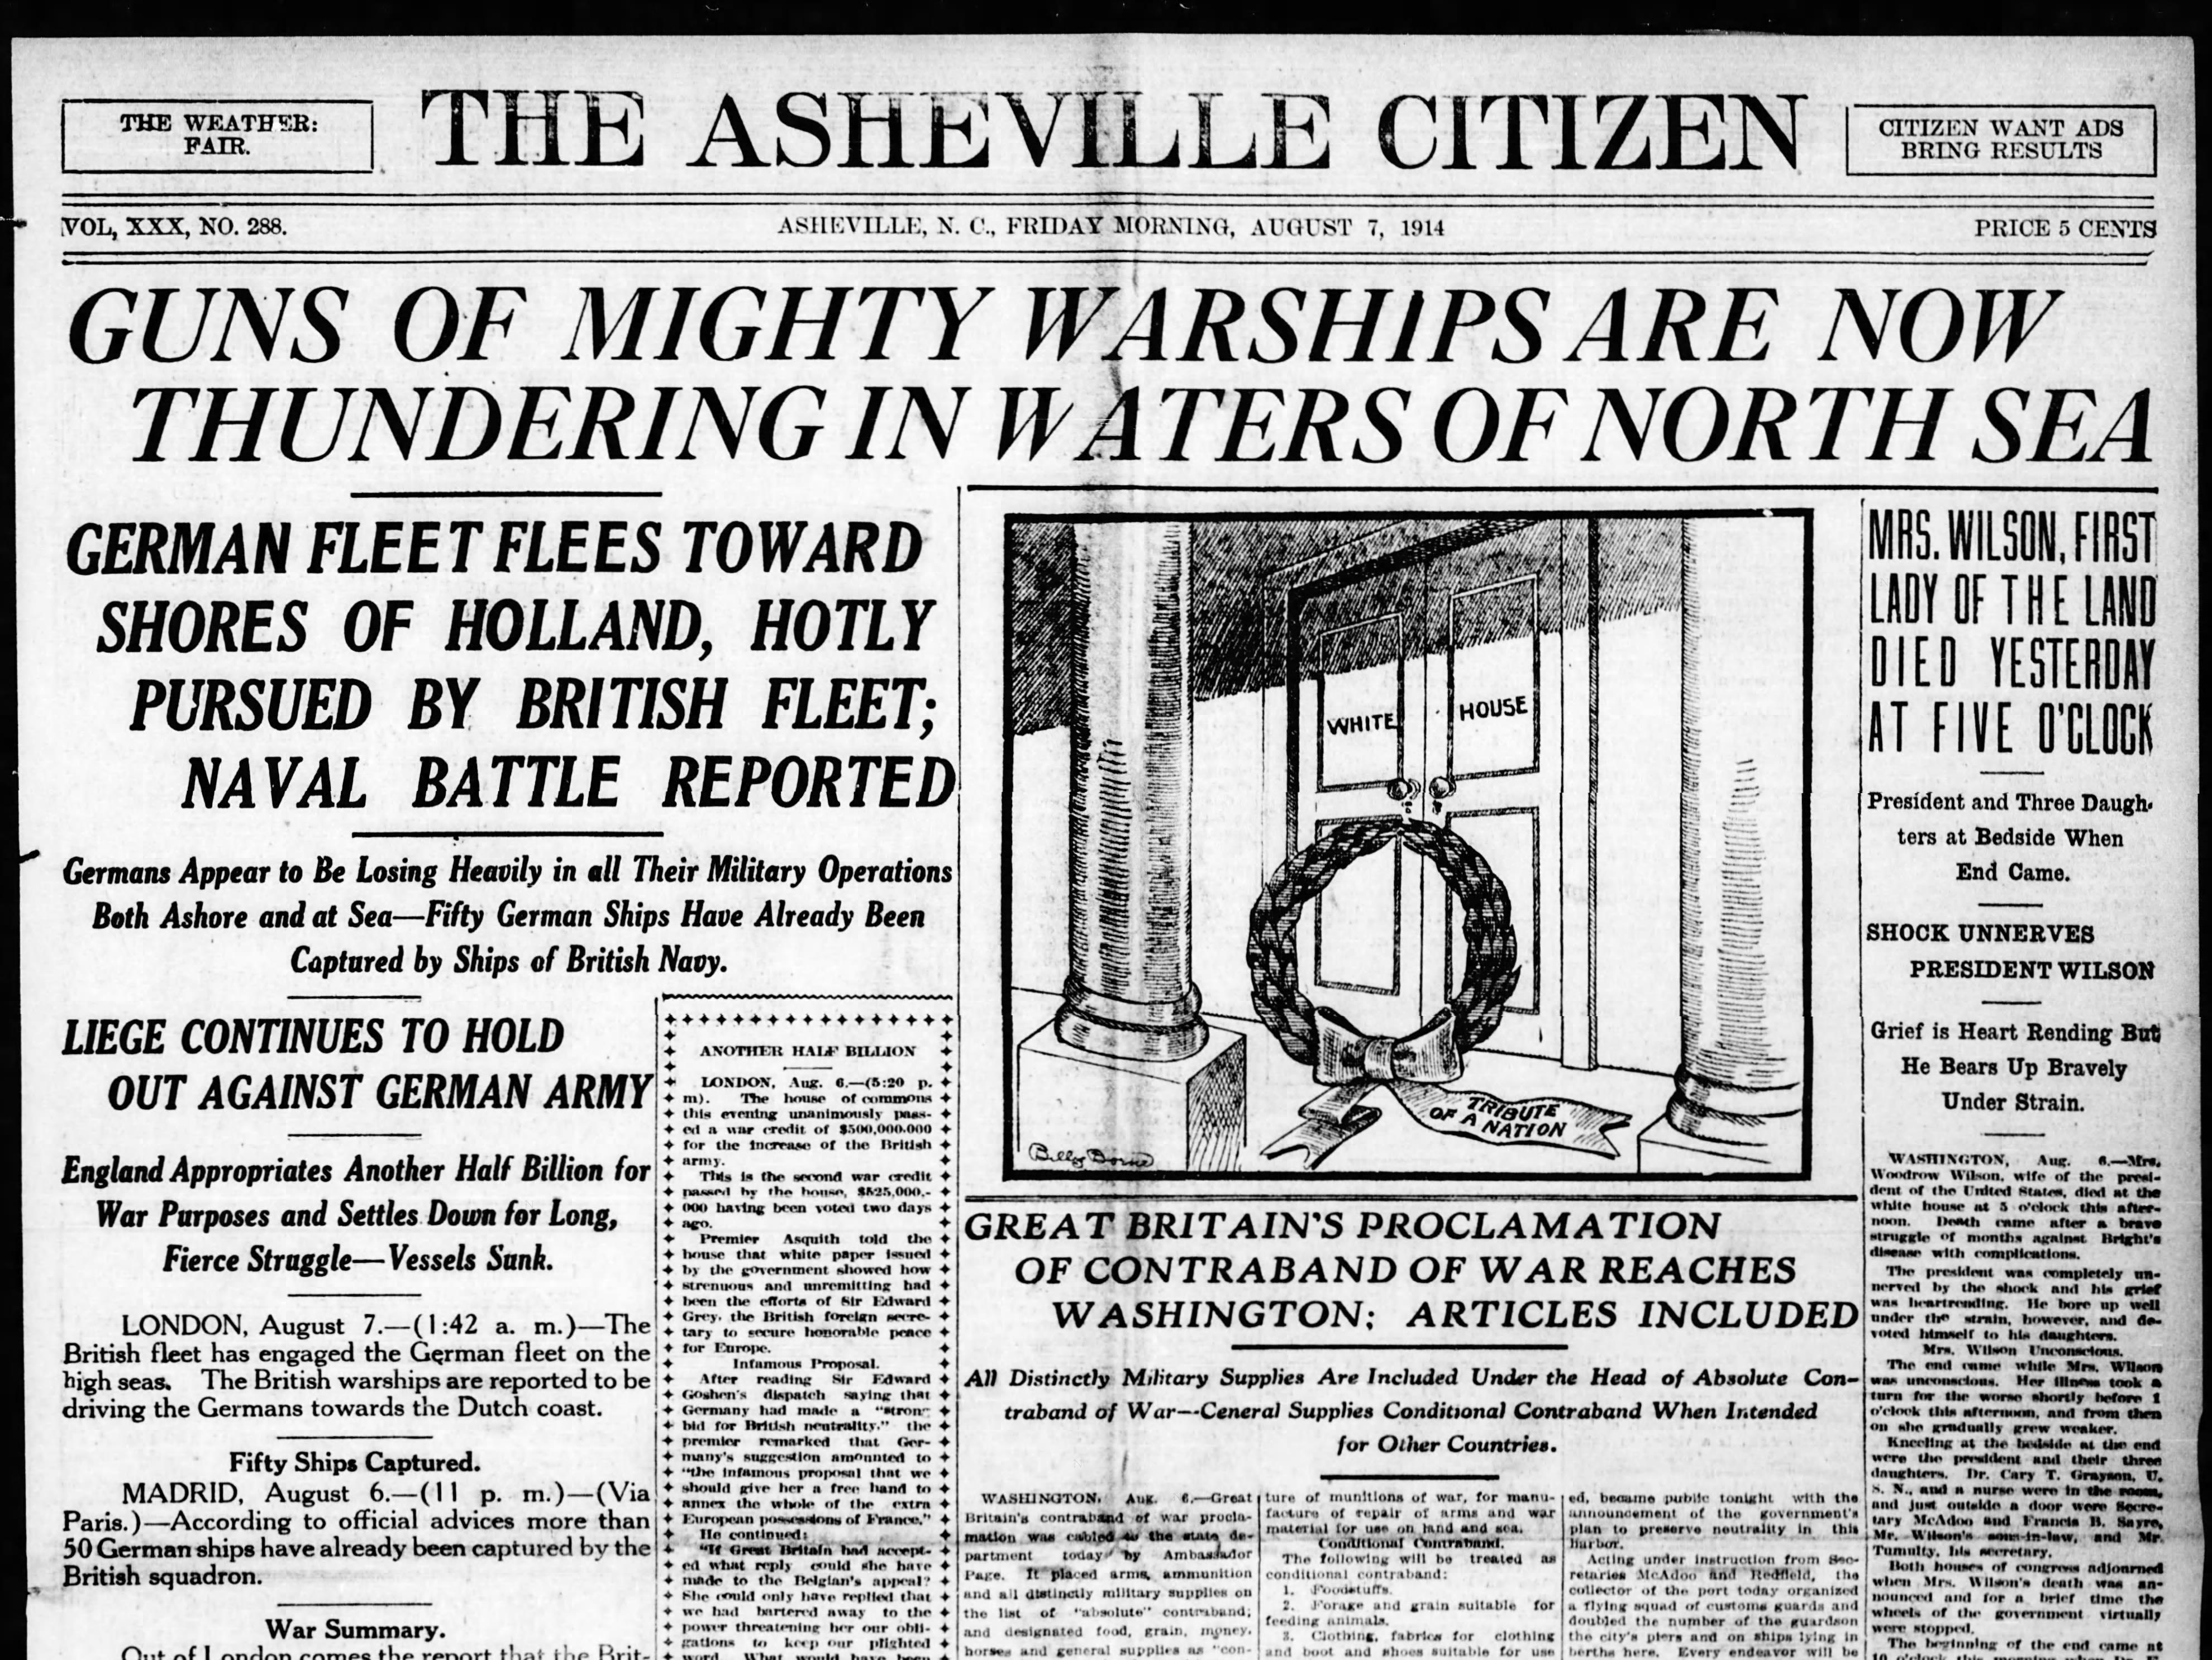 Asheville Citizen, Aug. 7, 1914.